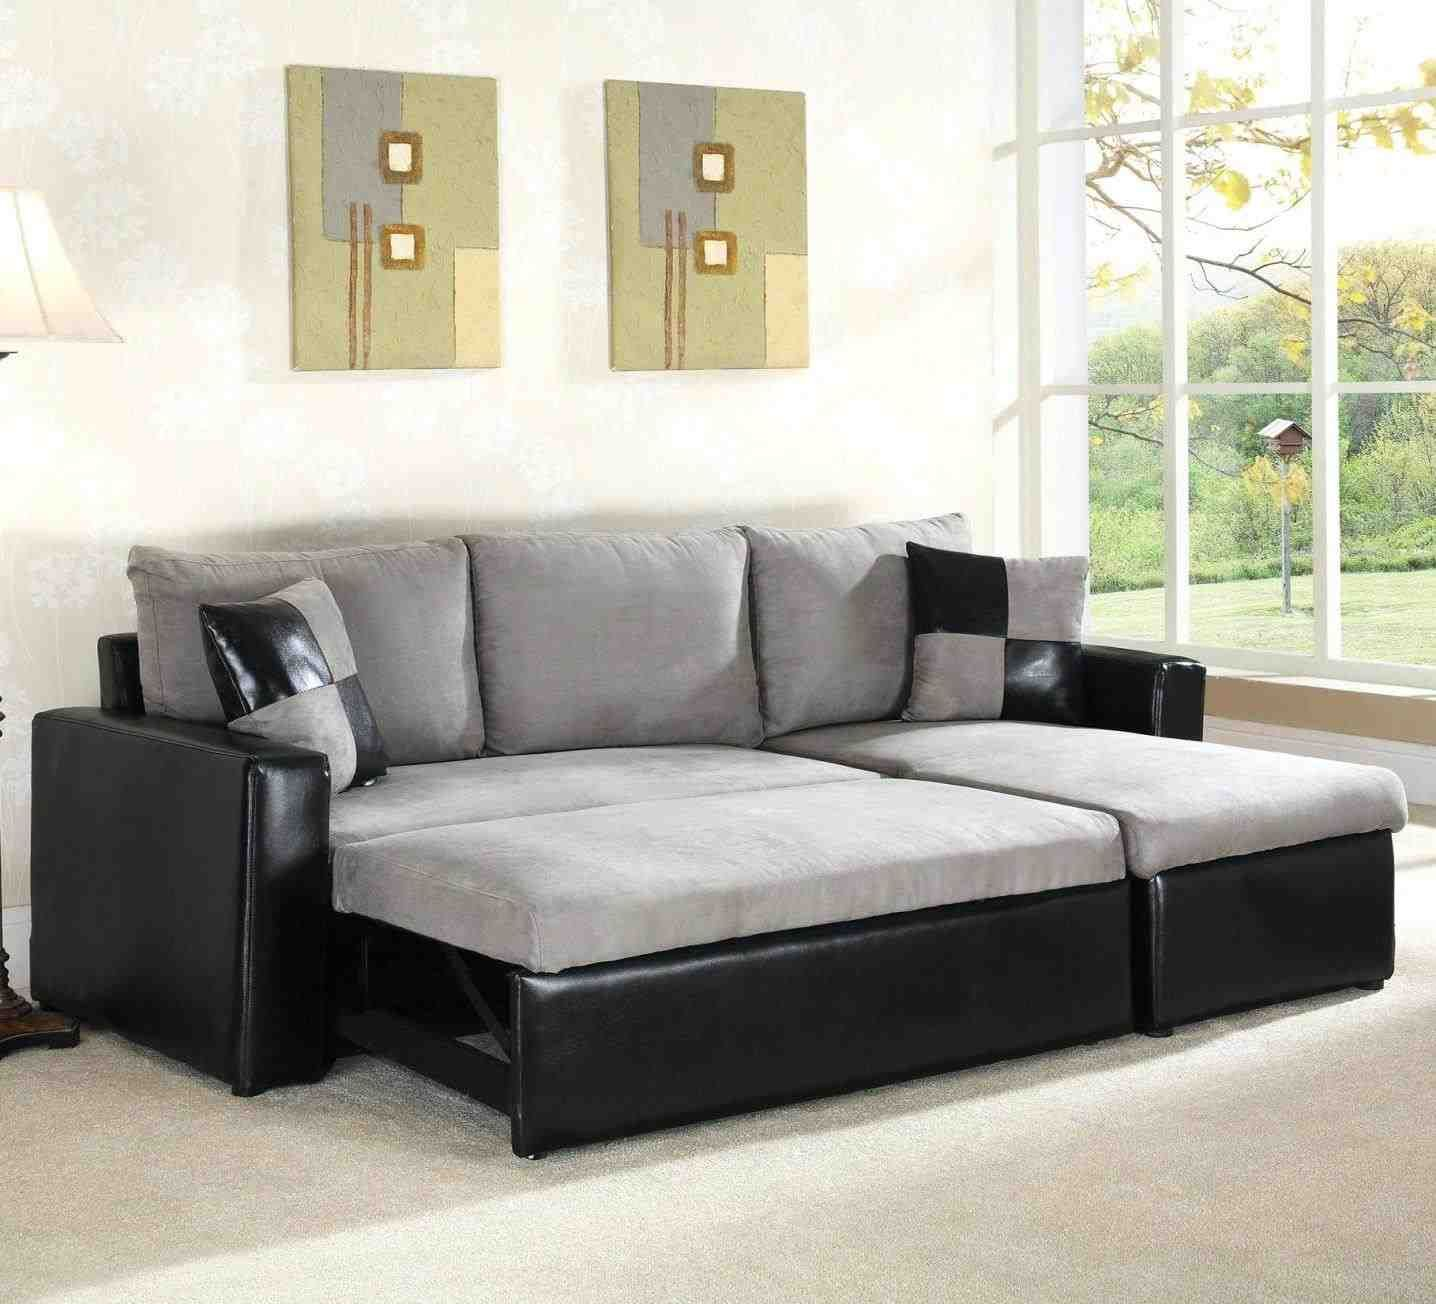 Cheap Sofa Ireland Full Size Of Couch Room Sofas Ireland Dublin Sofas Round Couches Ikea Ireland Dublin Cou Modern Sofa Sectional Sectional Sofa Sofa Design